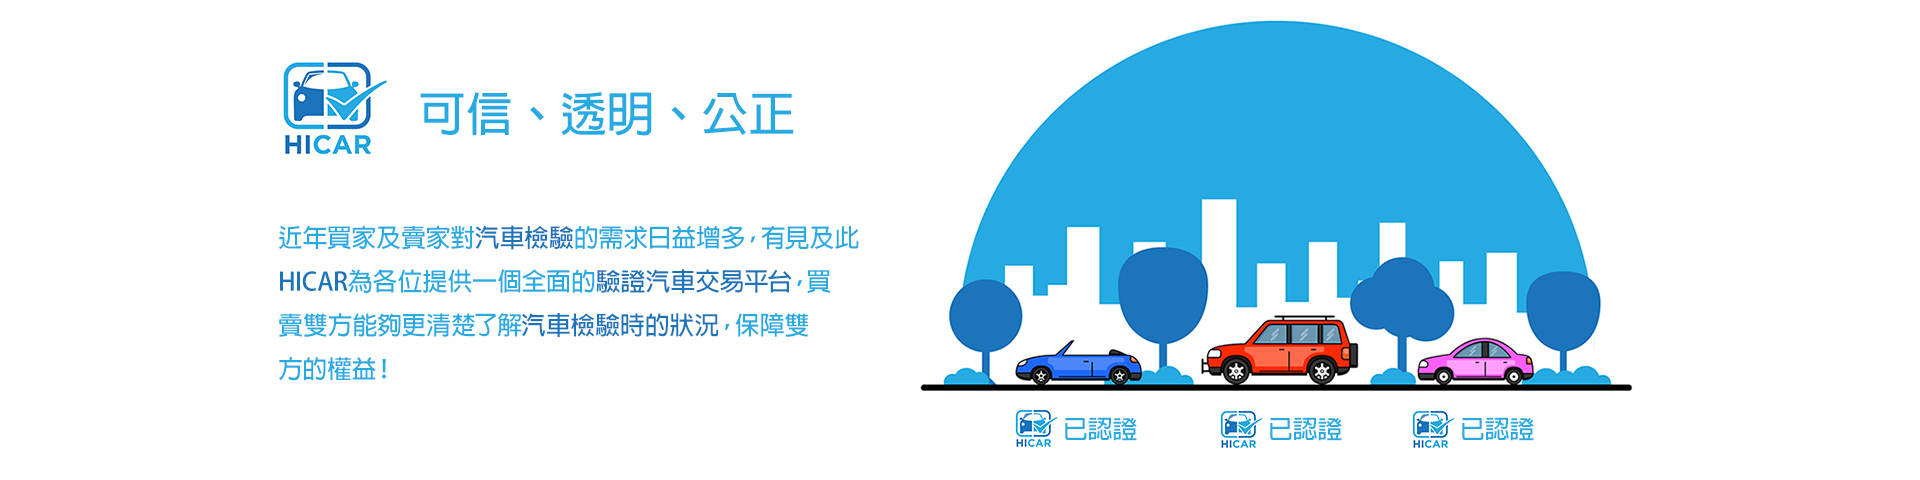 https://hicar.com.hk/wp-content/uploads/2018/07/可信透明公正.jpg